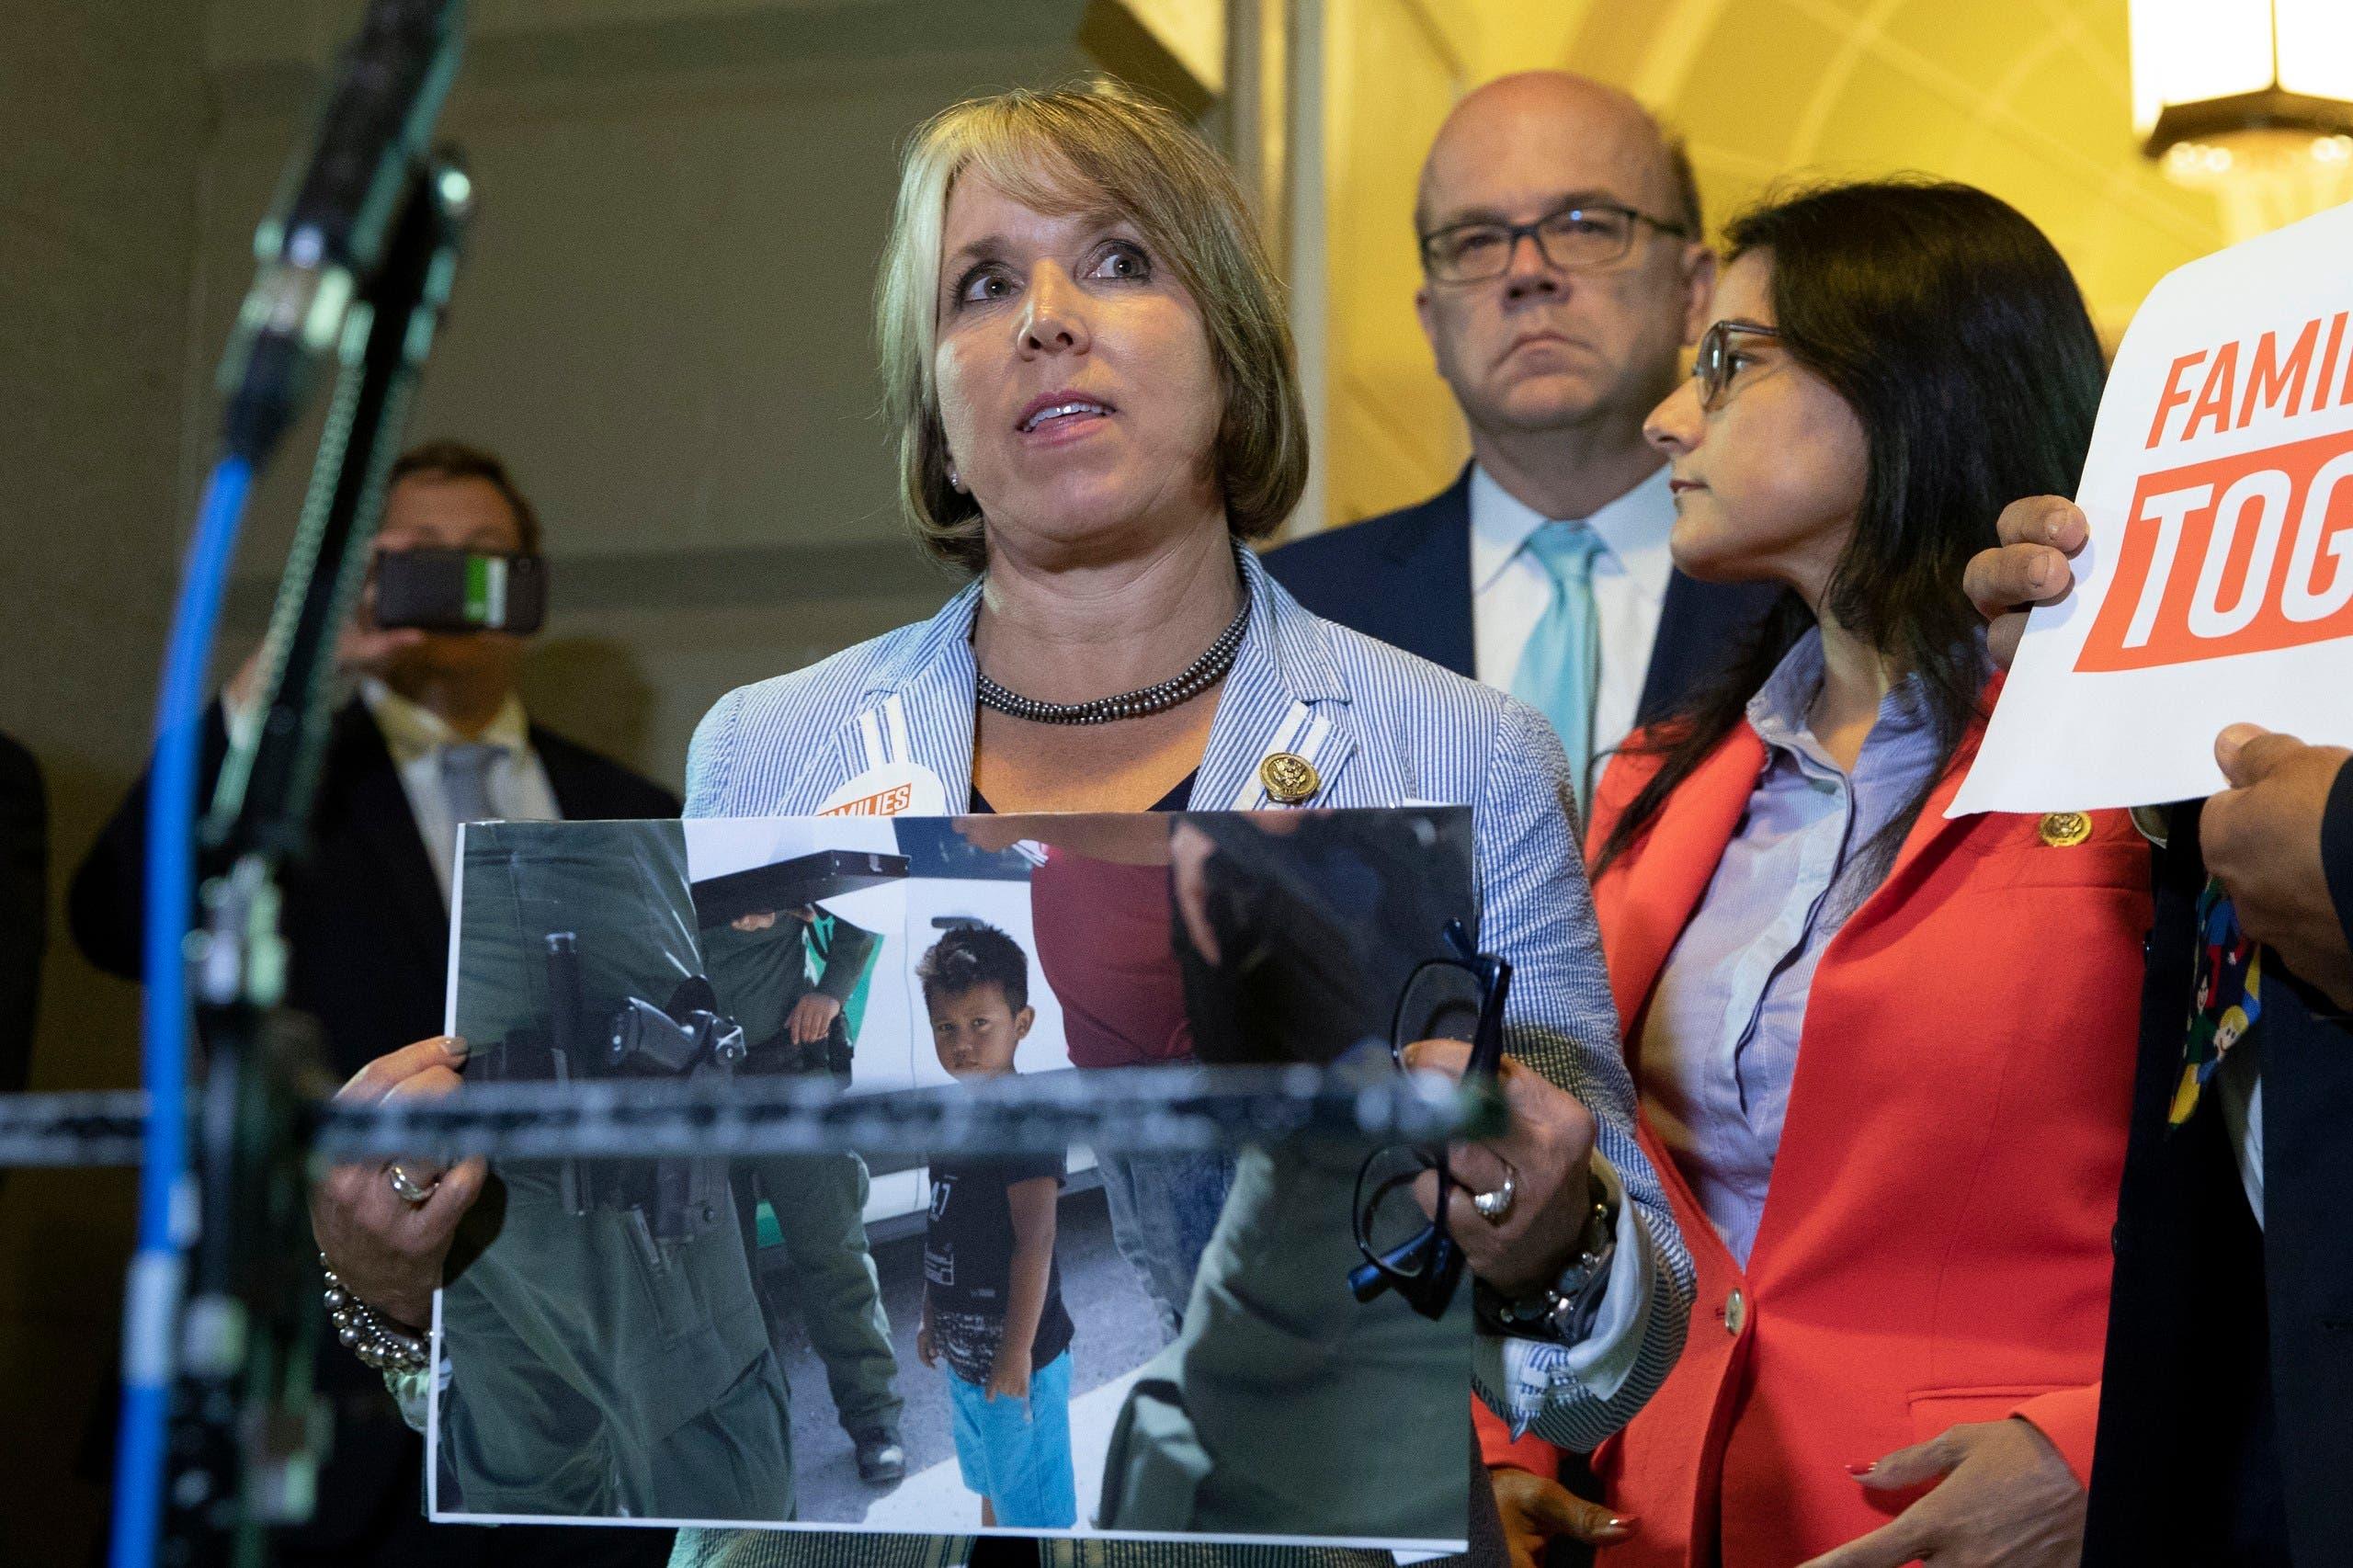 Michelle Lujan Grisham gives a speech. (File photo: AFP)